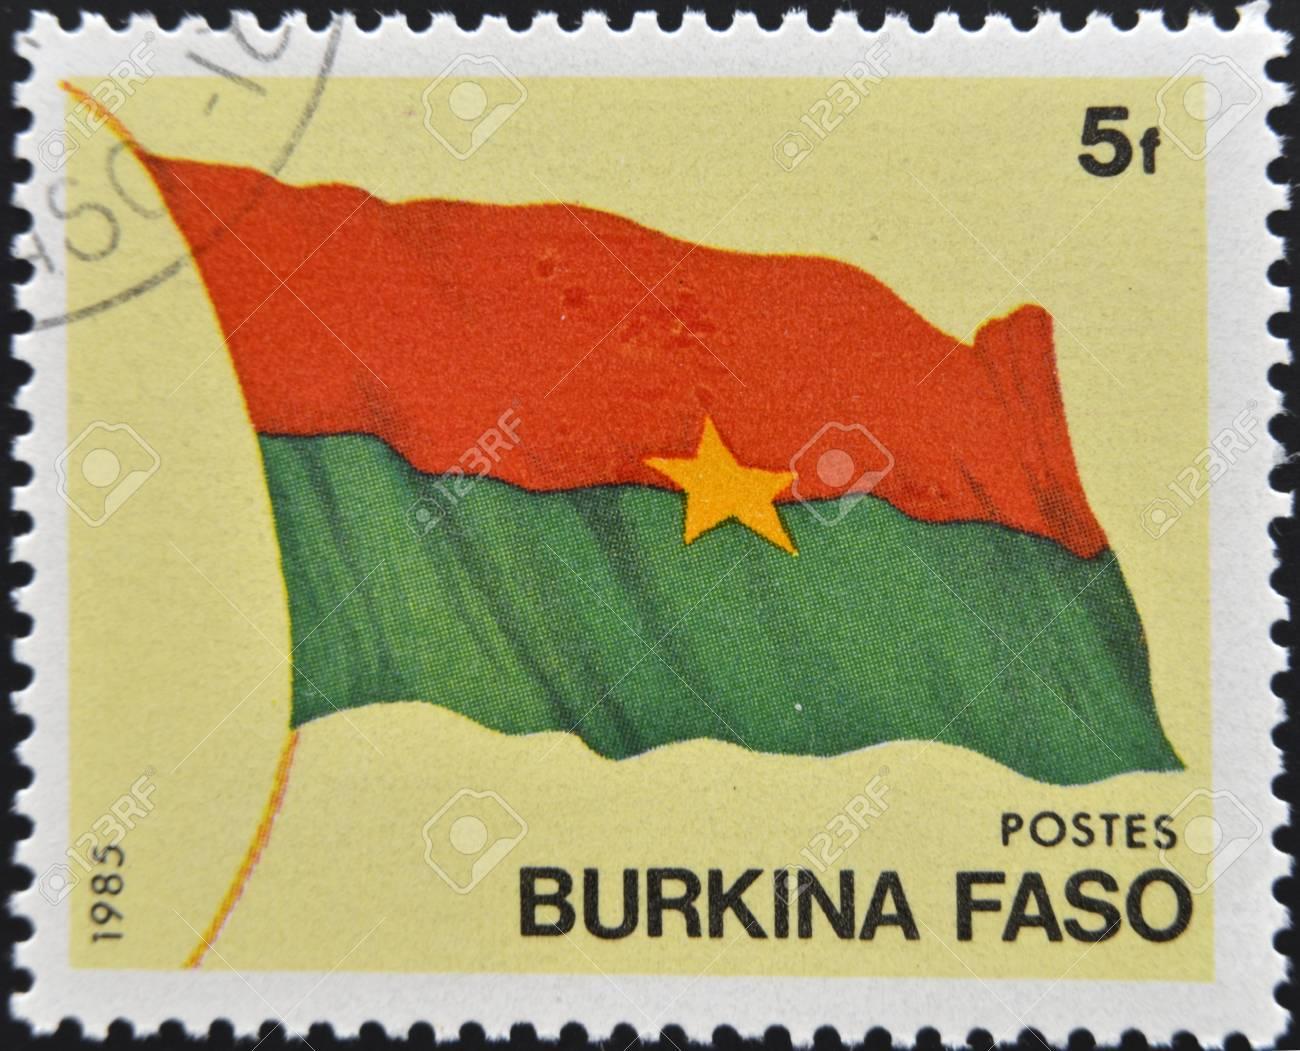 BURKINA FASO - CIRCA 1985  A stamp printed in Burkina Faso shows the flag, circa 1985 Stock Photo - 12570911